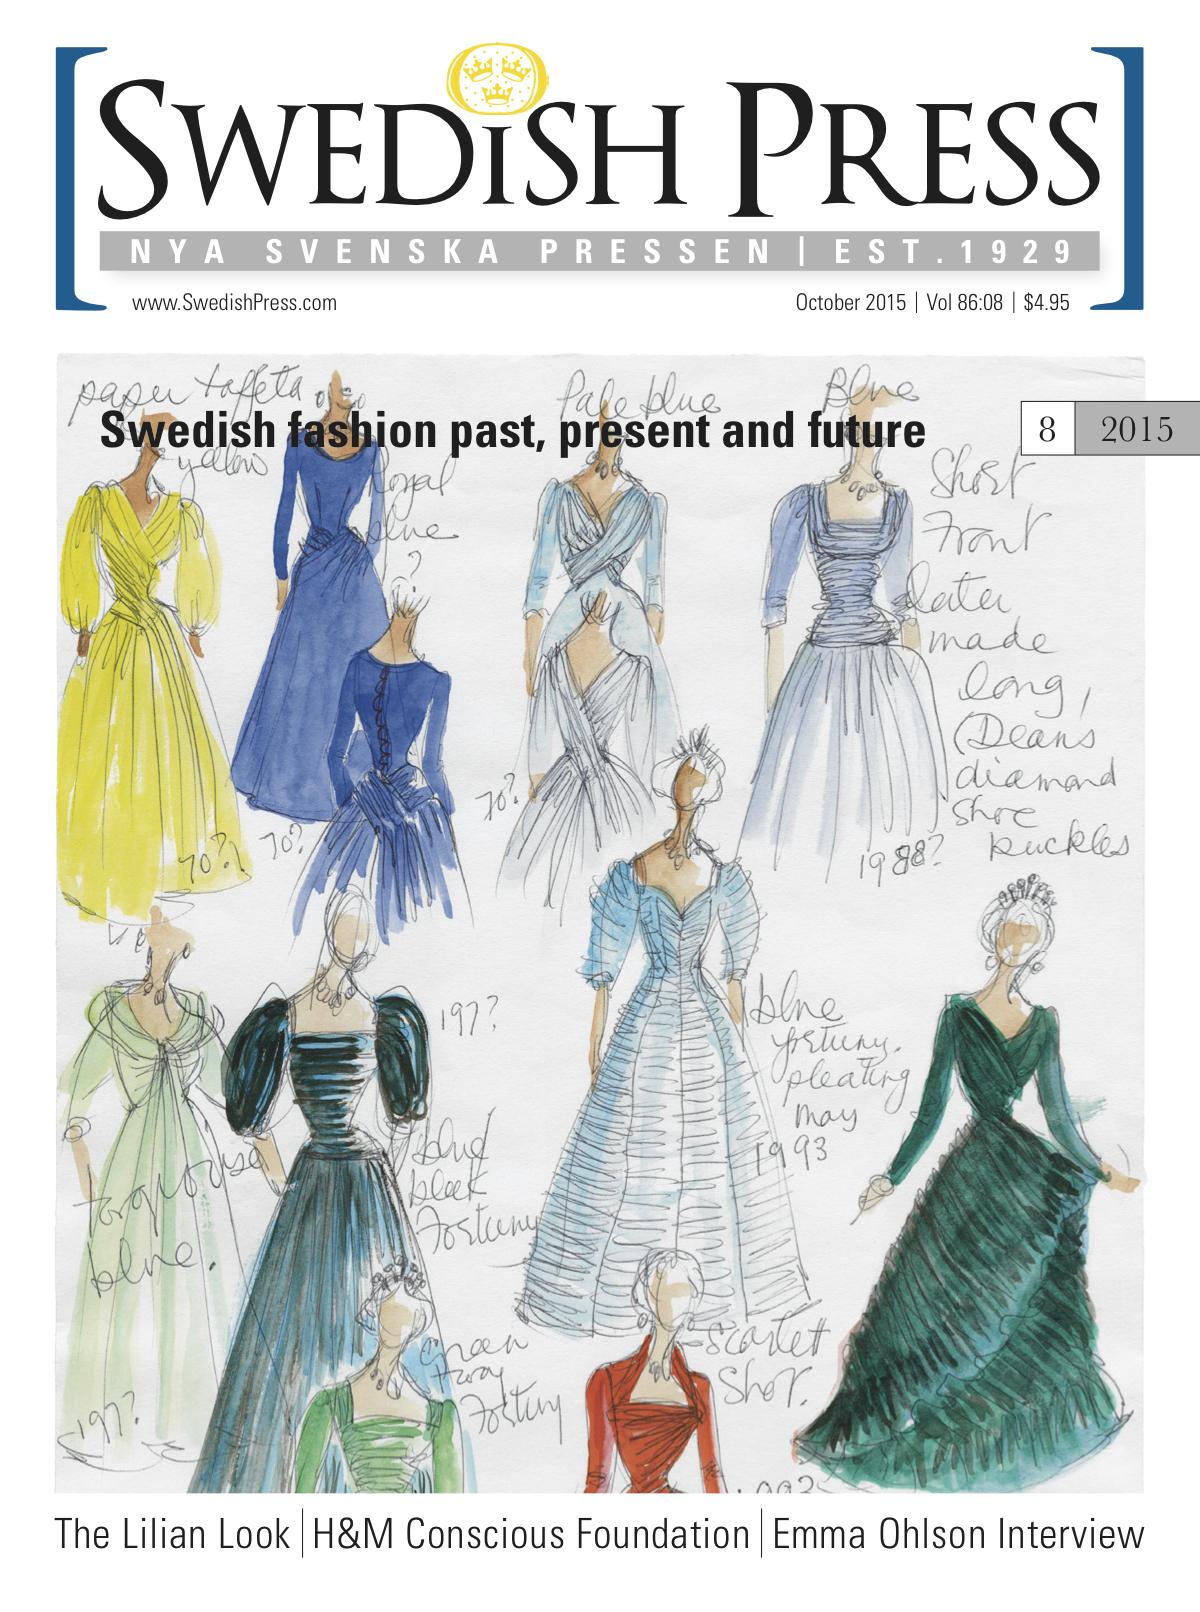 Swedish%20Press%20Oct%202015%20Vol%2086-08%20Sample.jpg